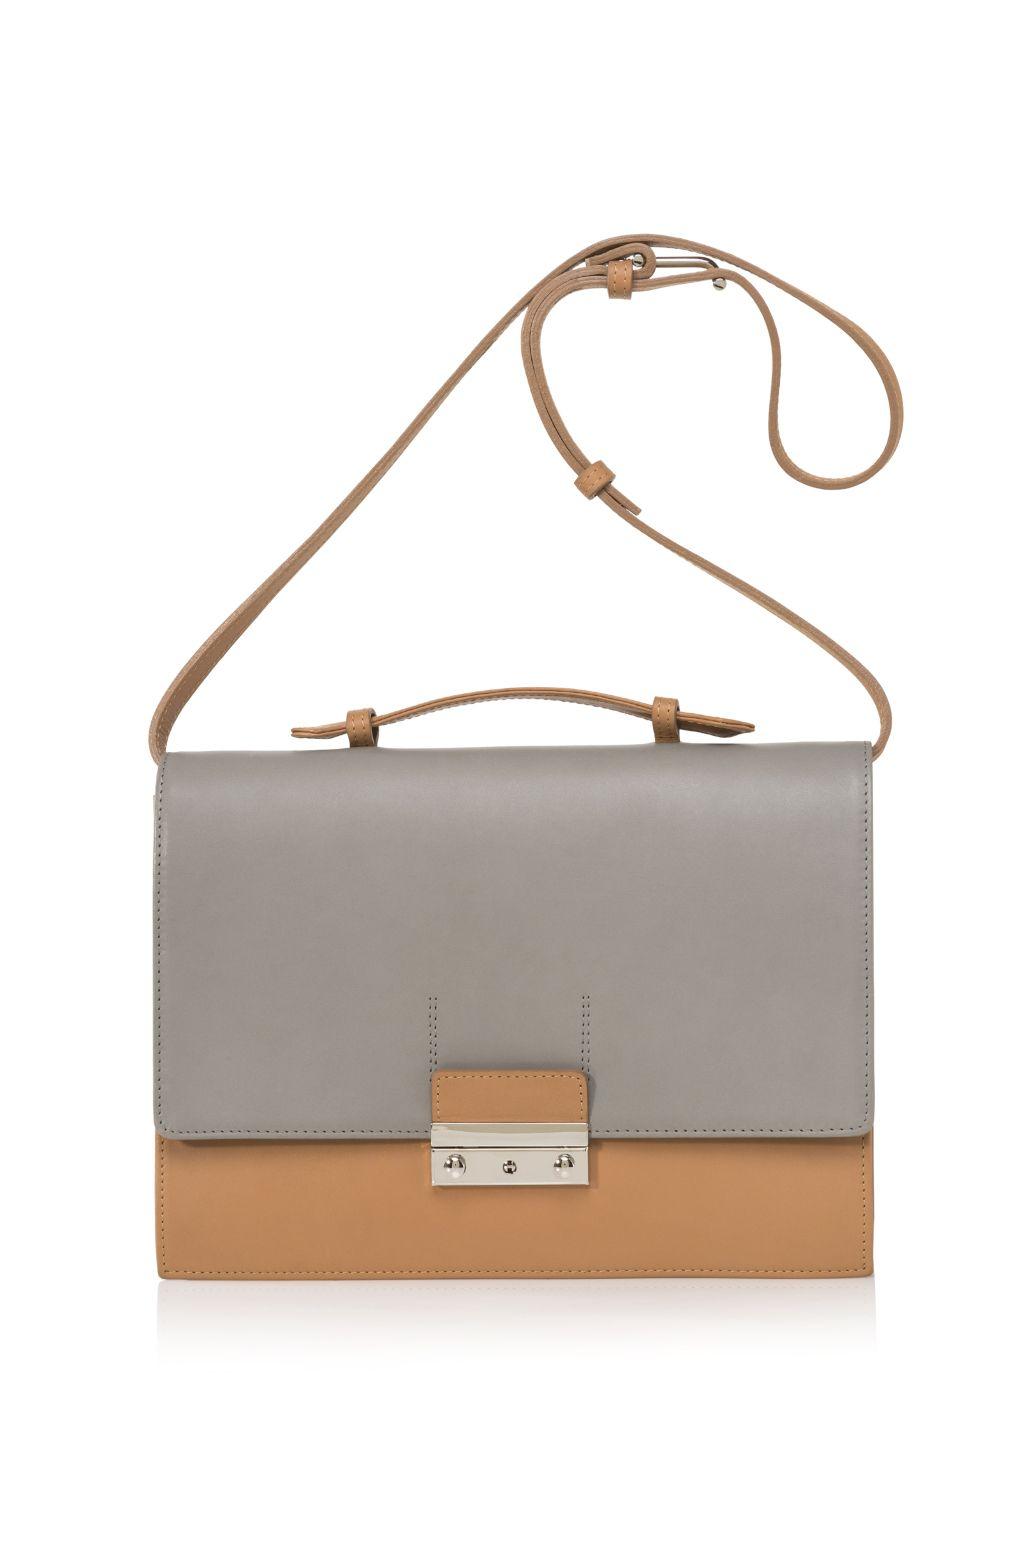 Handbag Designer Joanna Maxham Charts Quick Growth